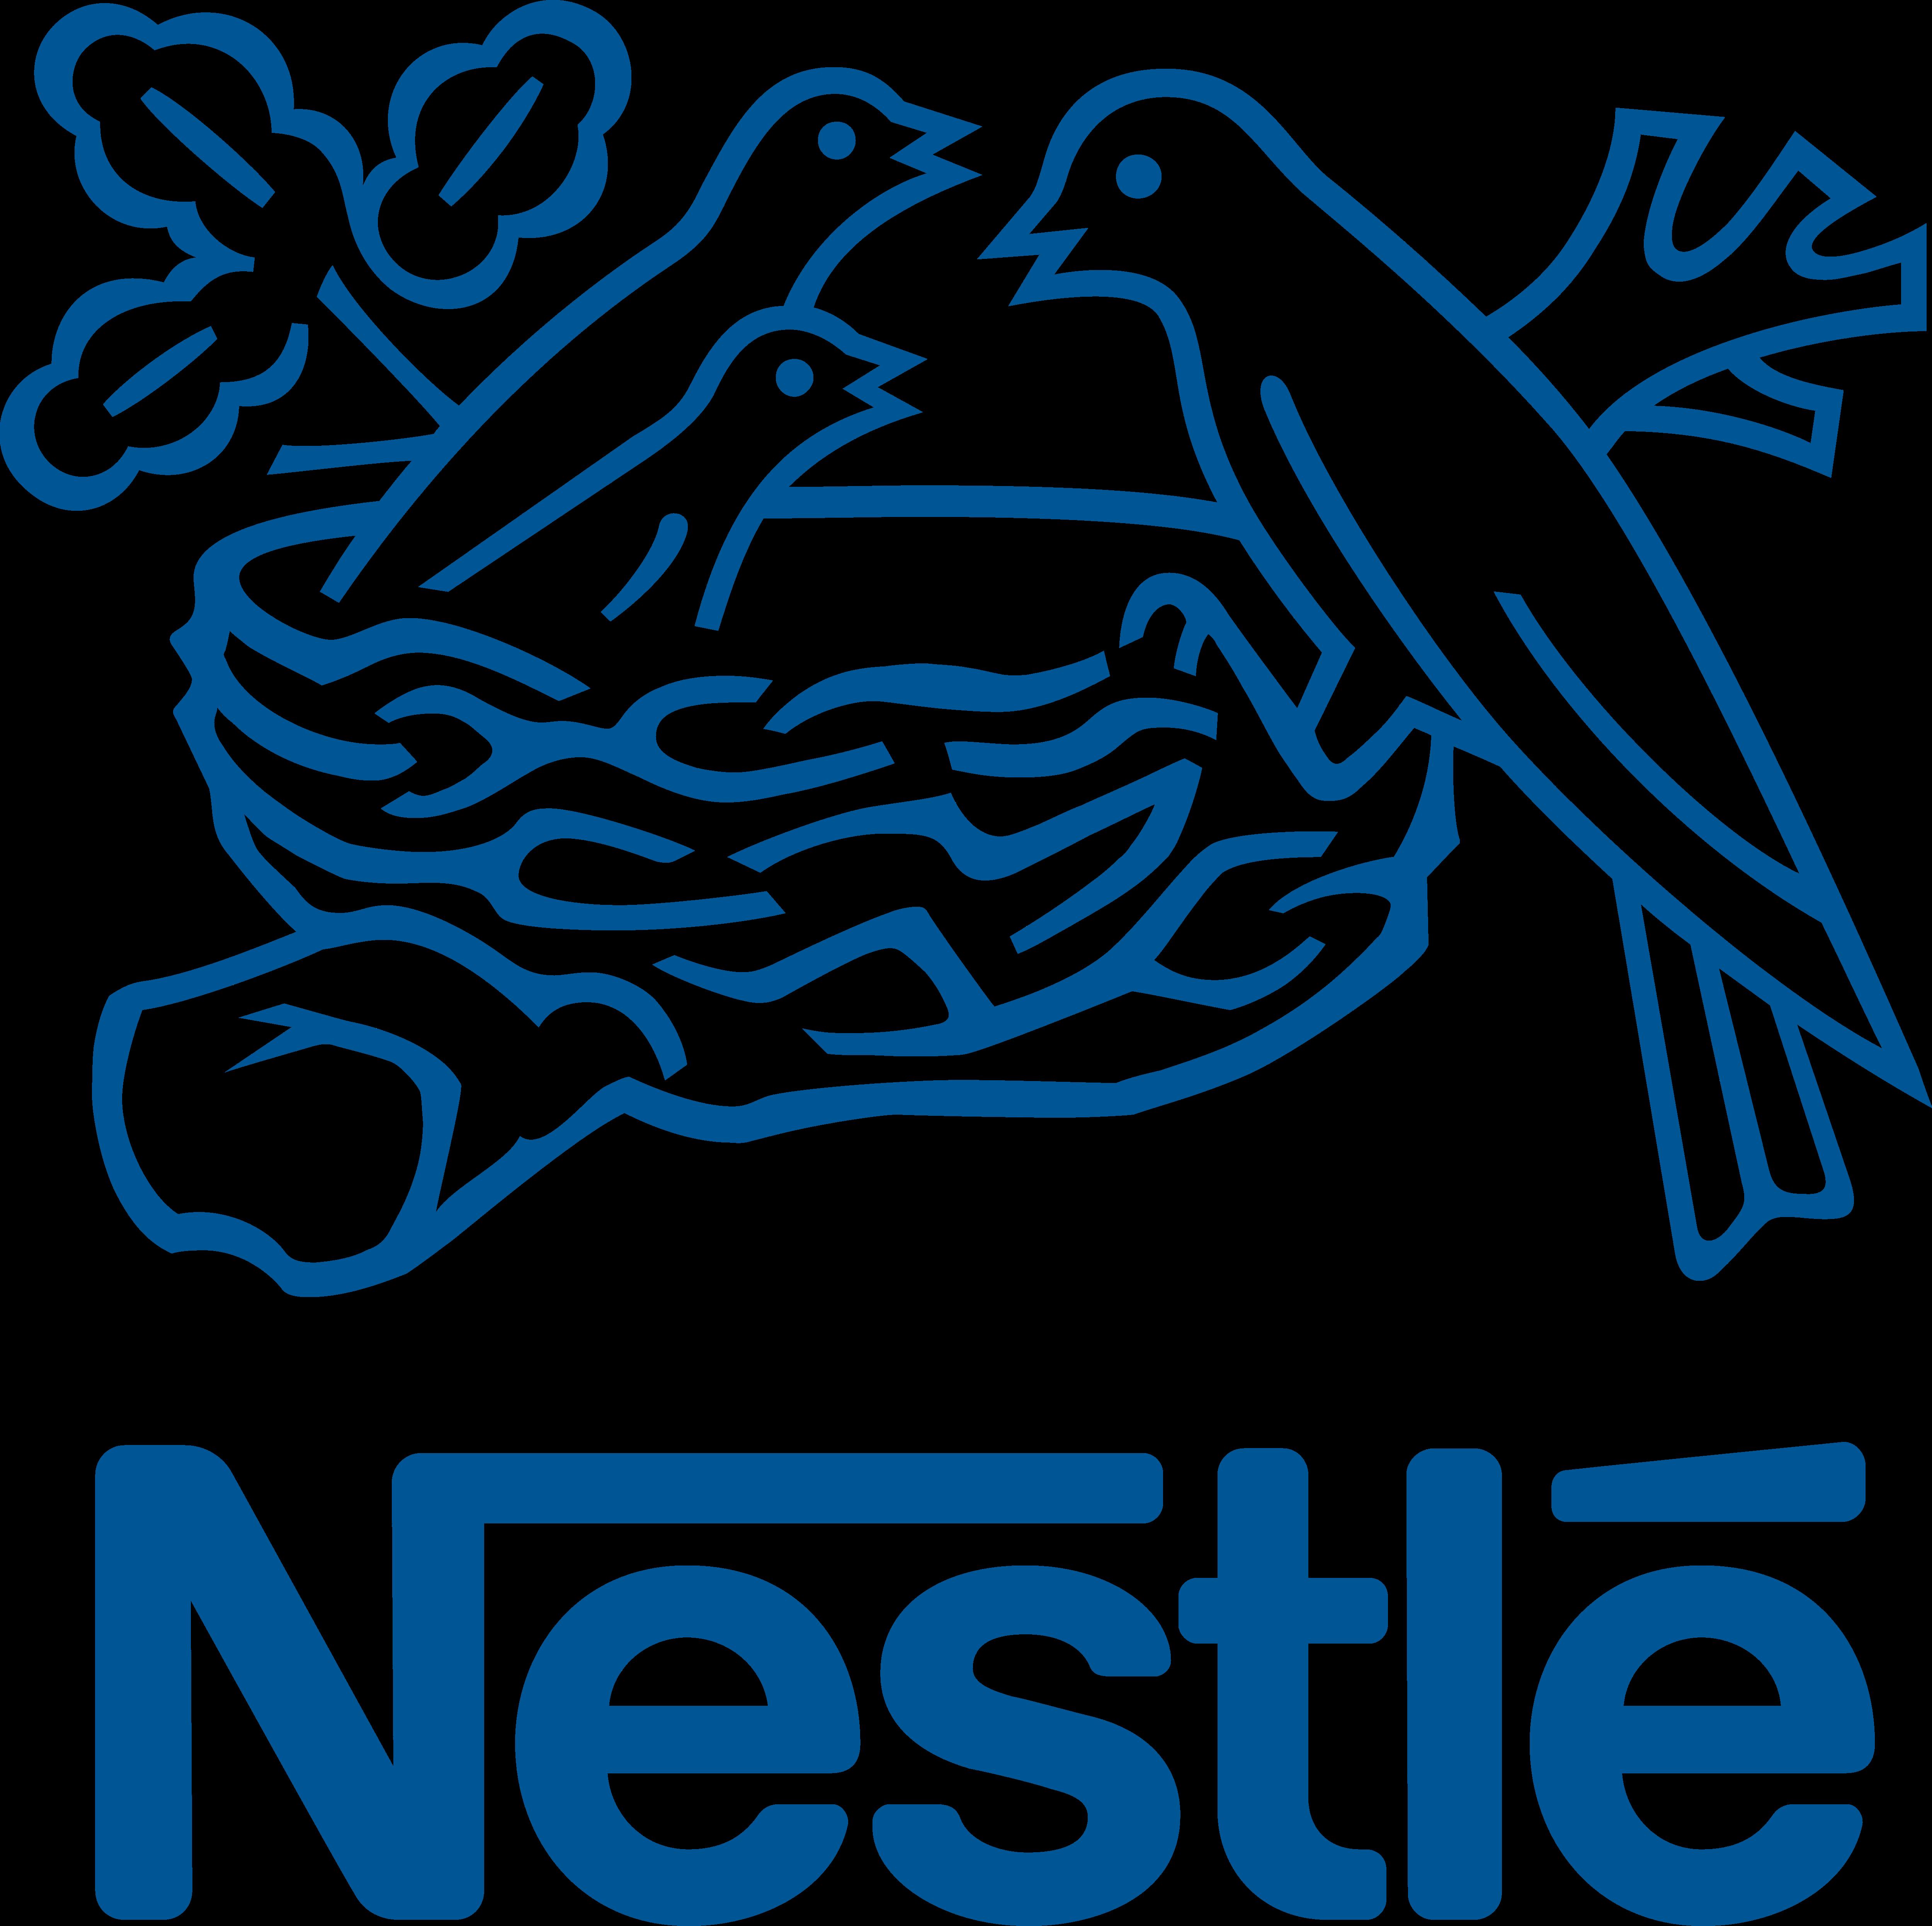 Nestlé lgoo